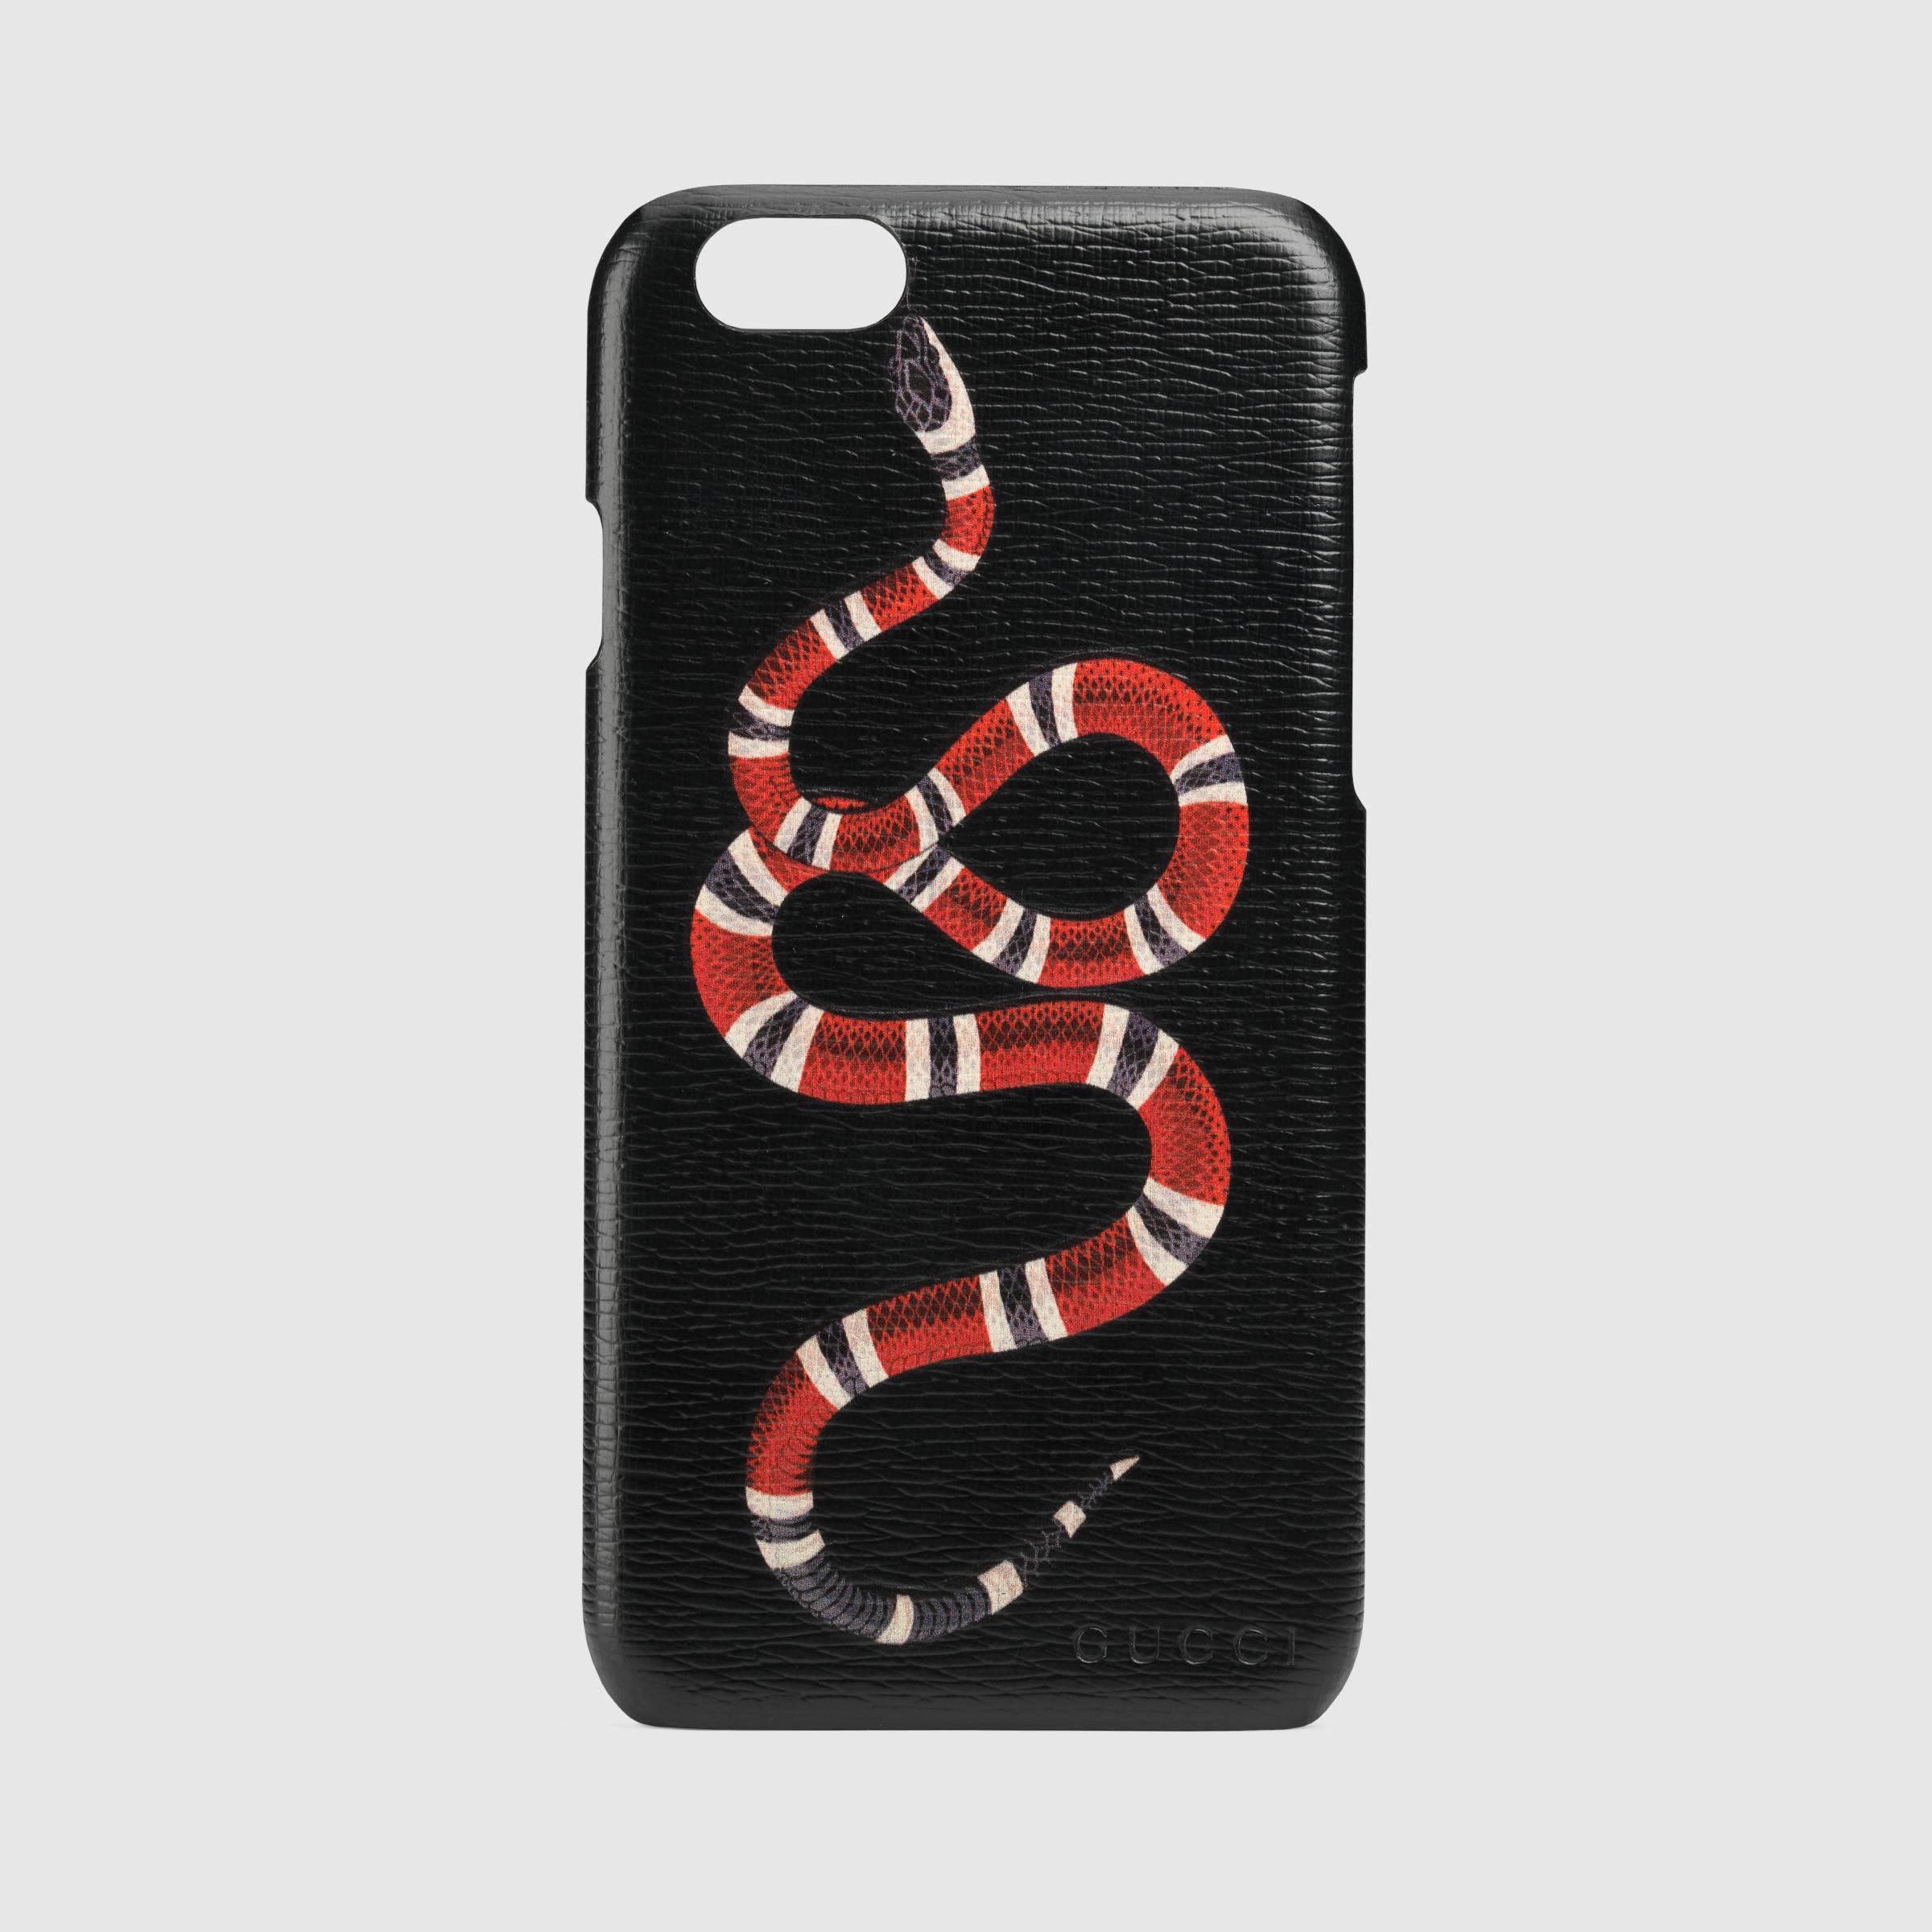 brand new 4c68c f526f Women's Black Snake Print Iphone 6 Case